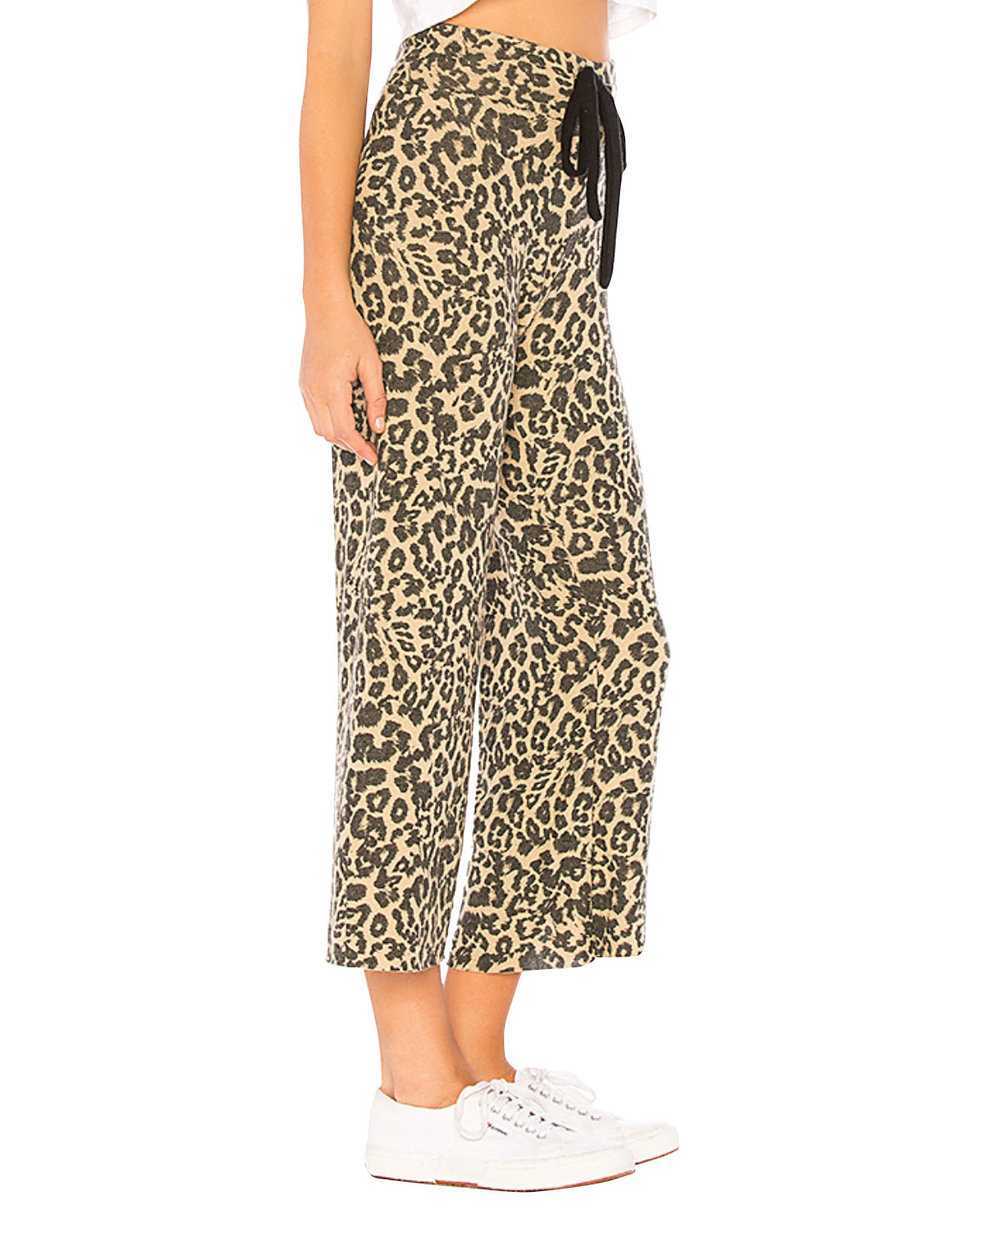 LNA Leopard Print Pants     $125